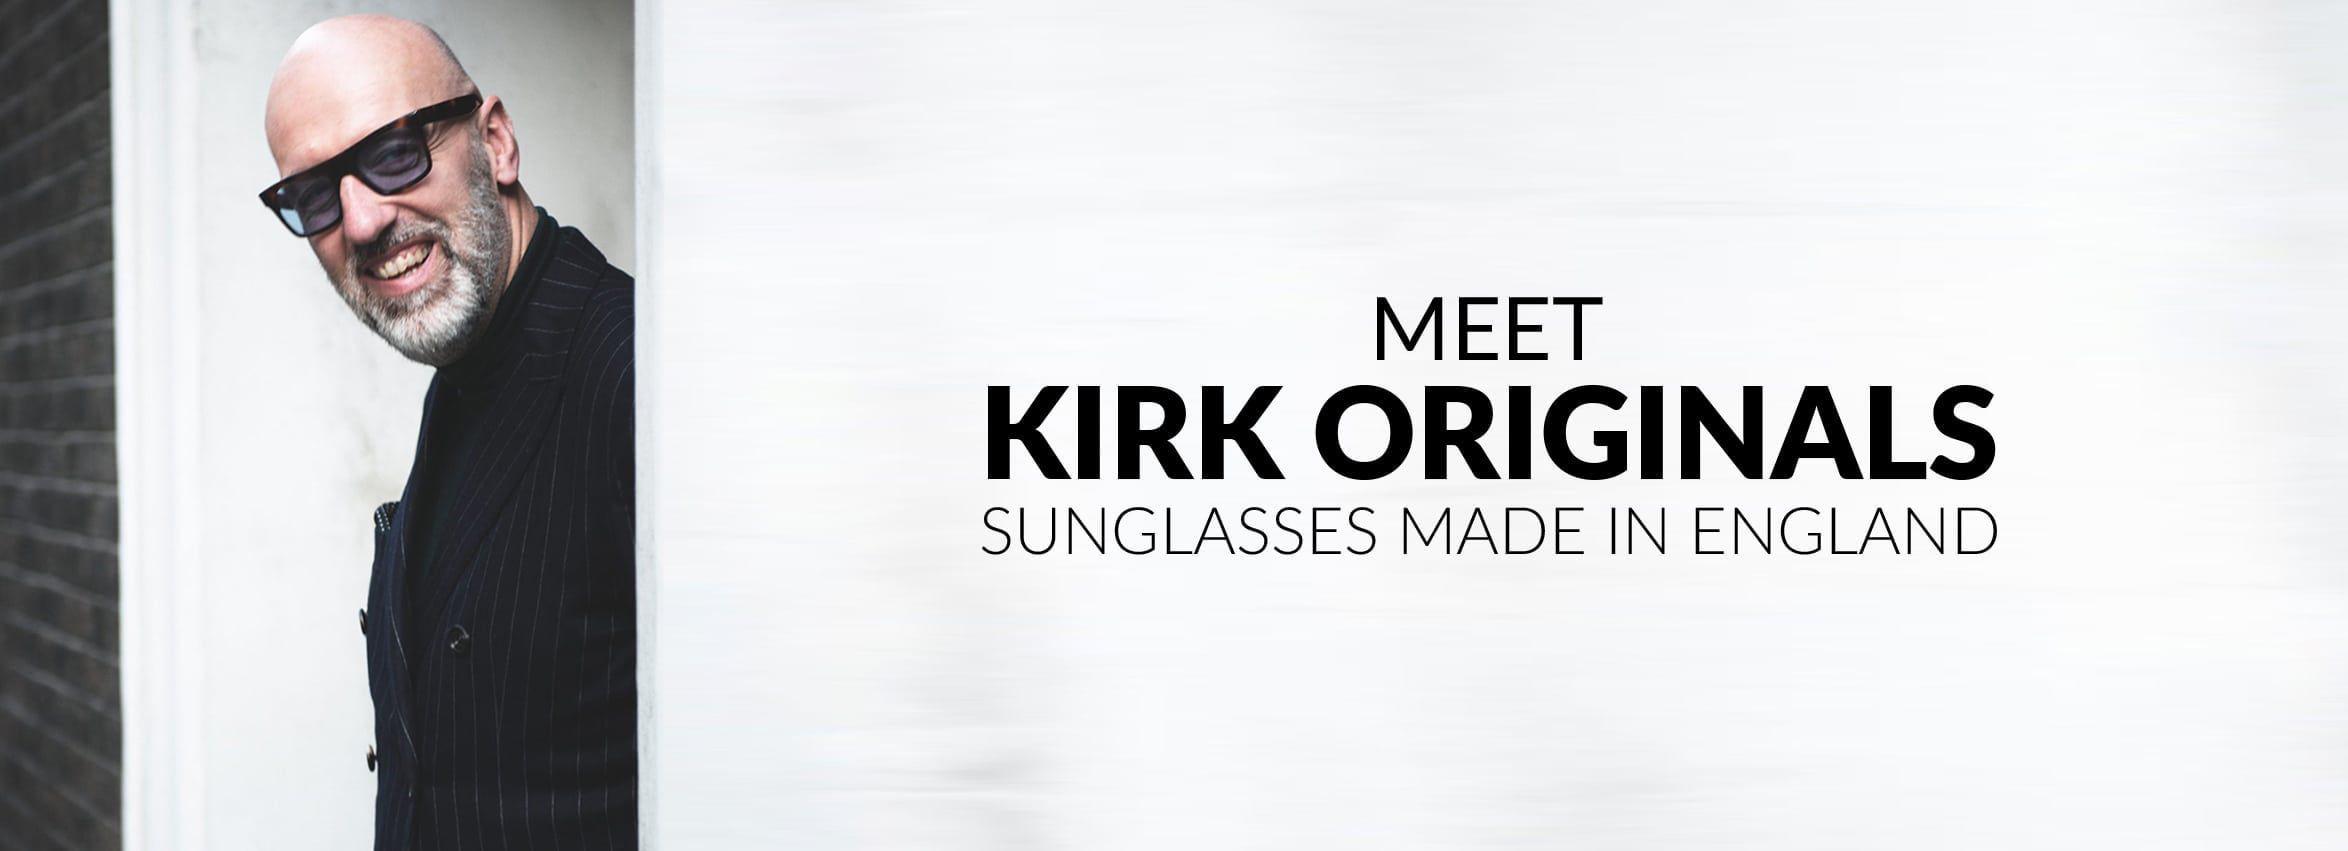 Meet Kirk Originals Sunglasses Made in England